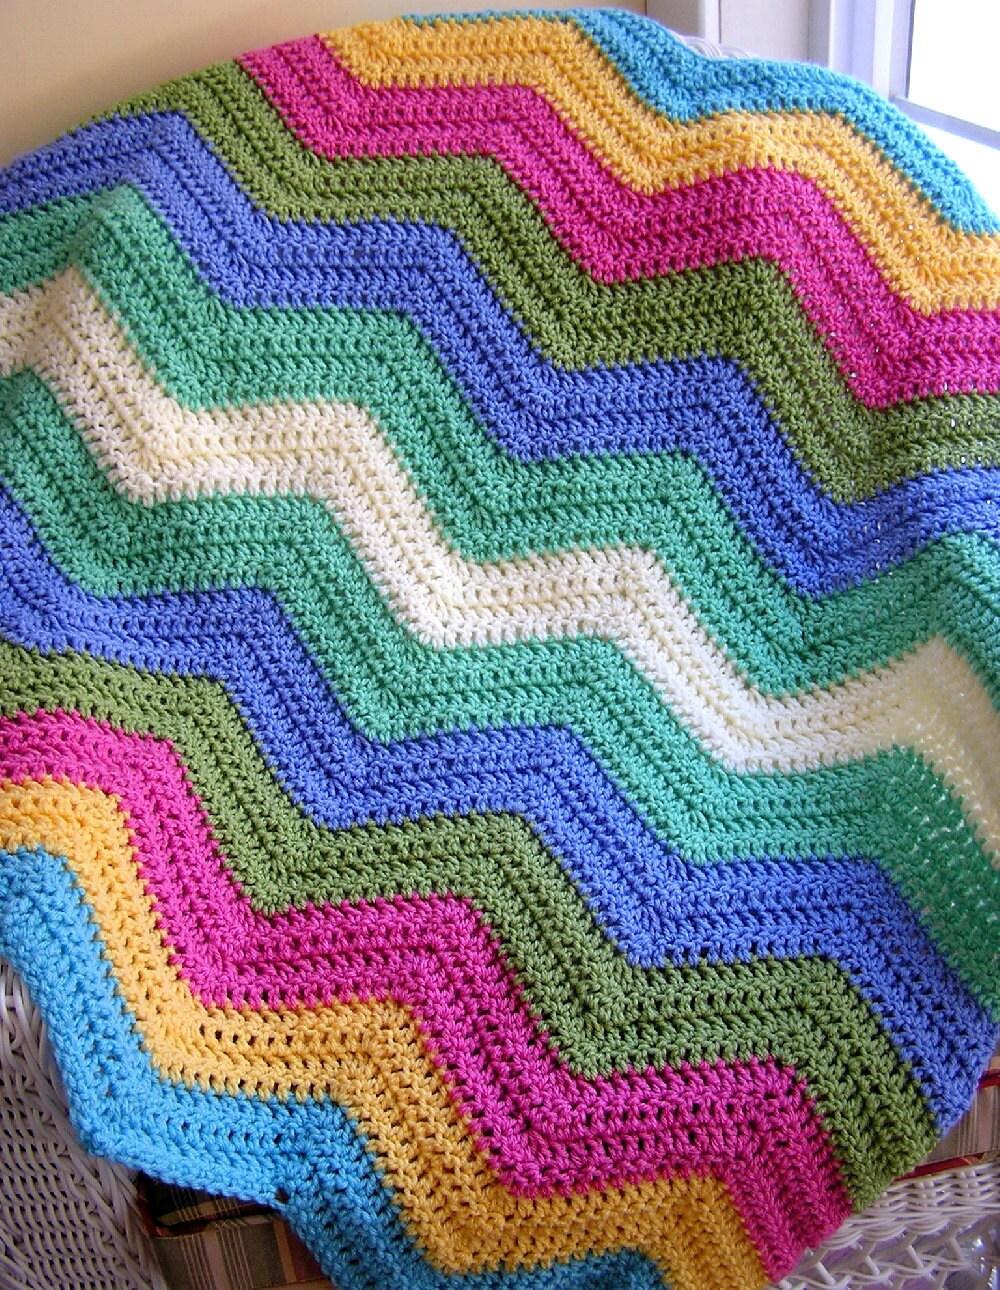 Knitted Zig Zag Afghan Pattern : chevron zig zag baby blanket afghan wrap by JDCrochetCreations